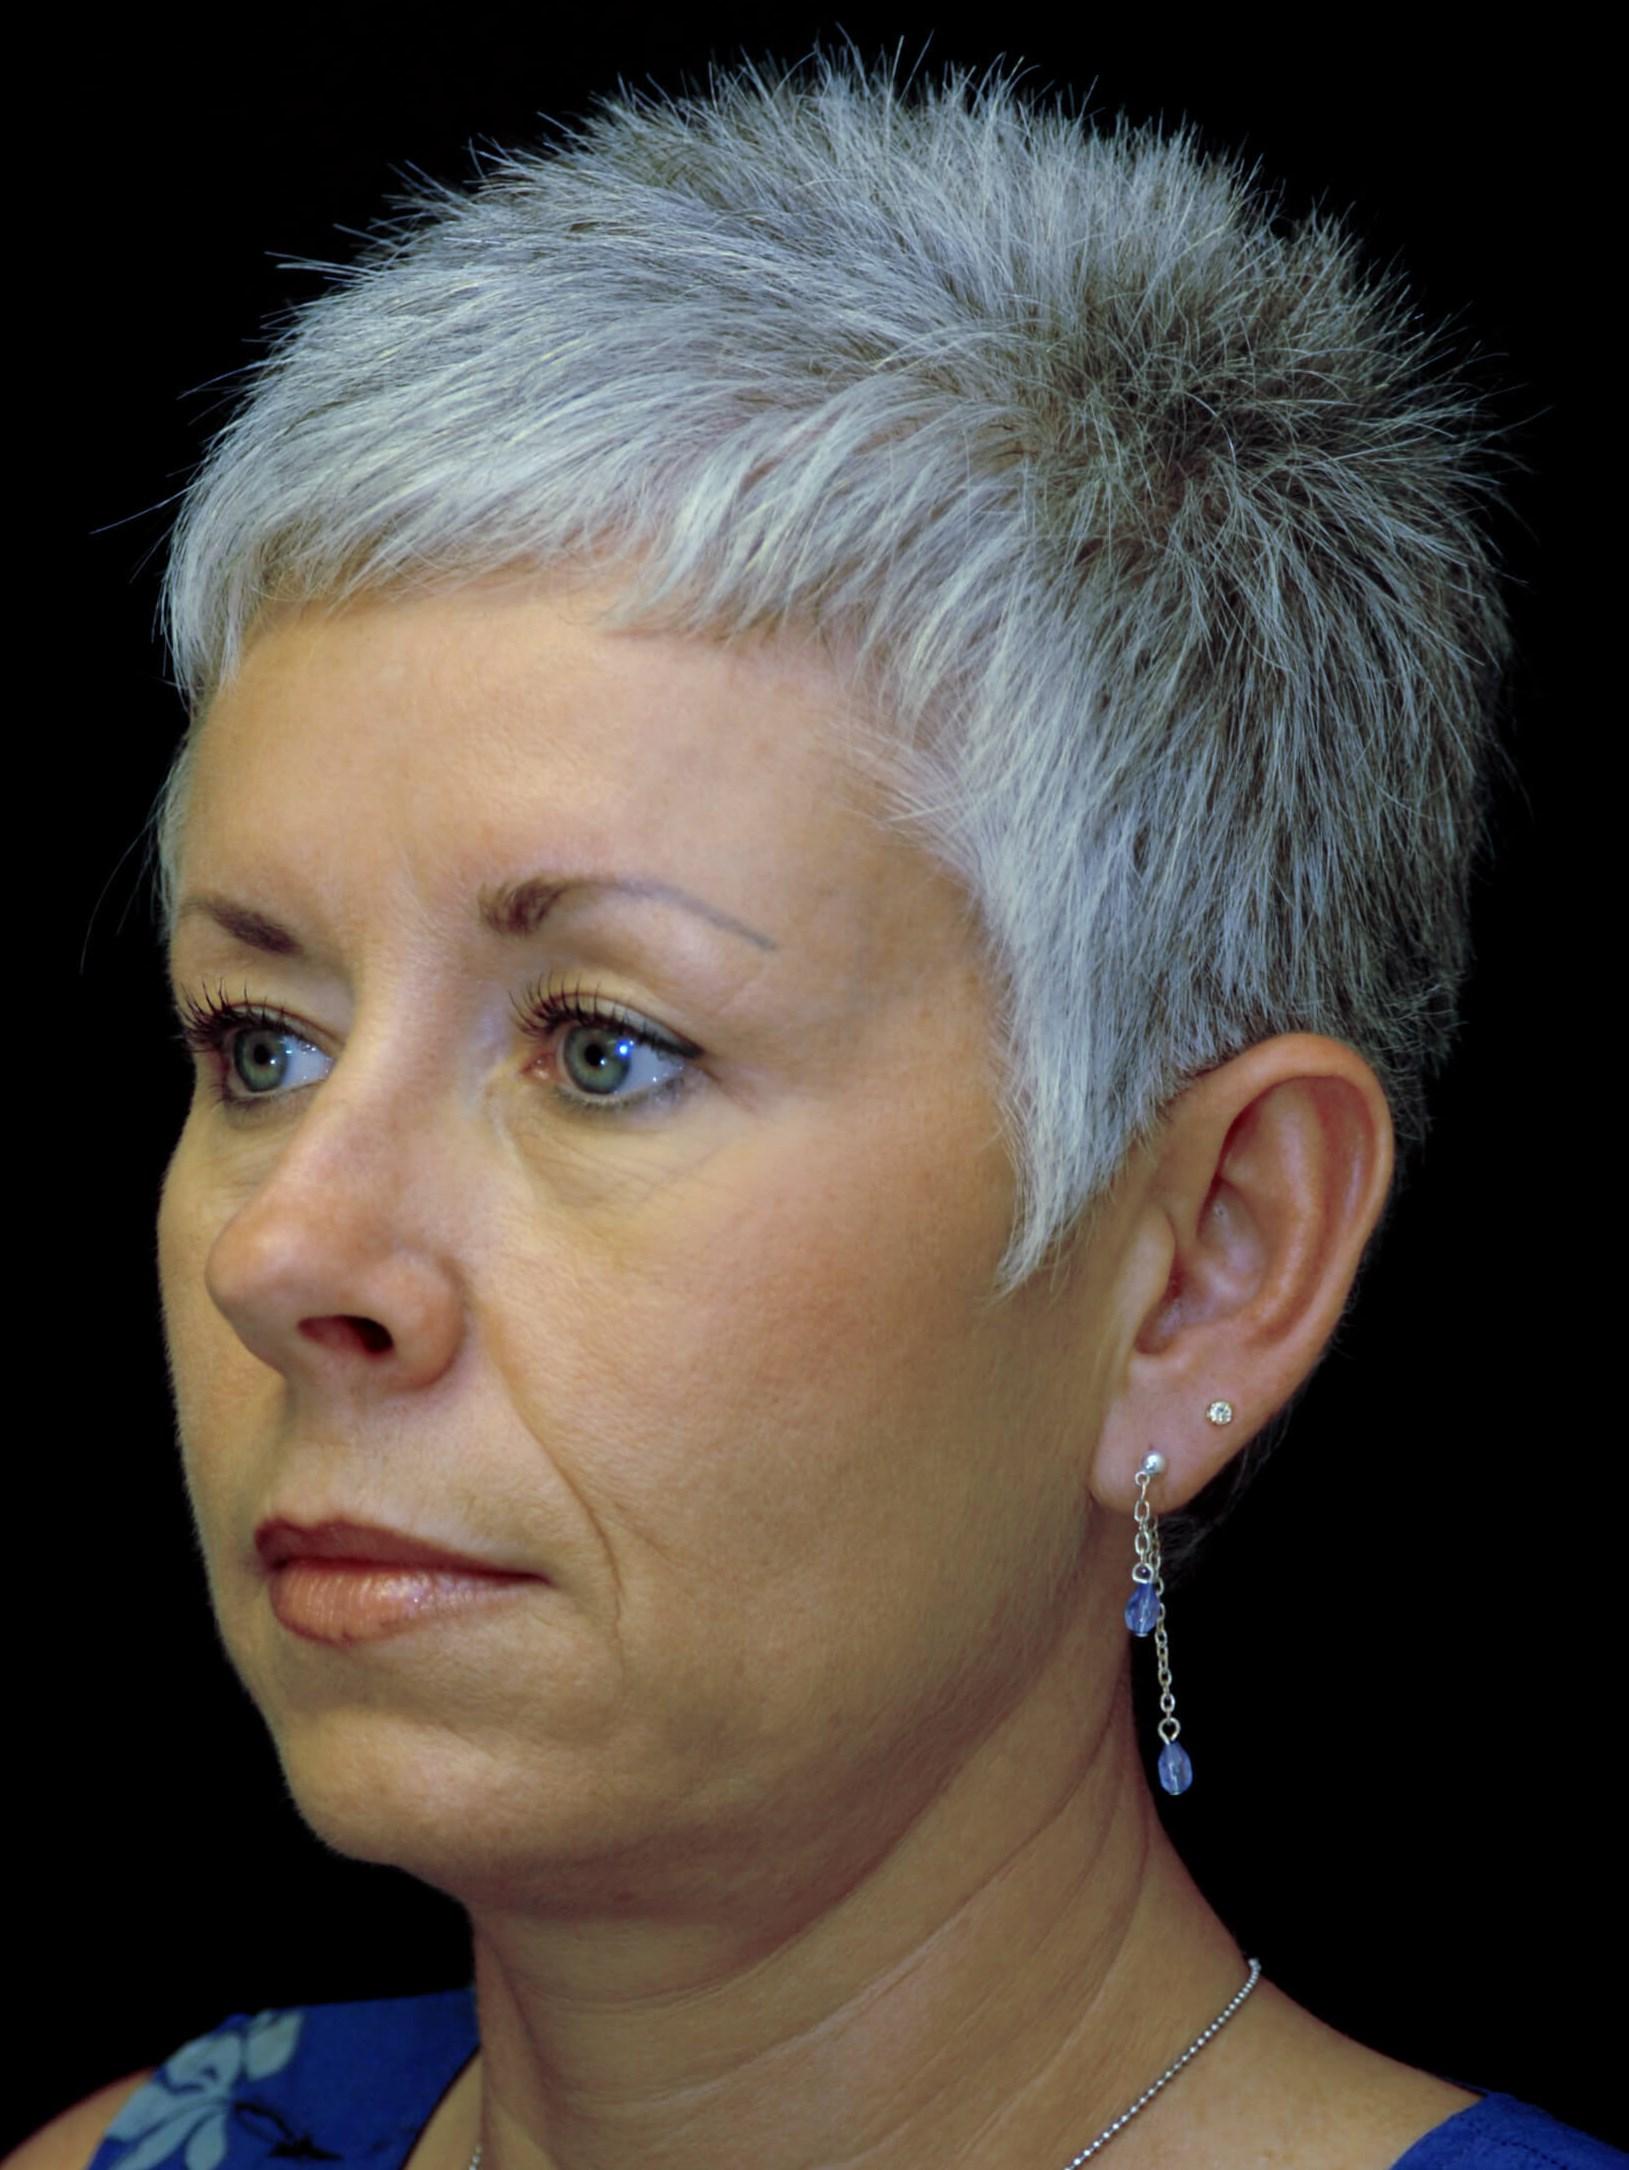 DALLAS WOMAN REJUVENATES LOOK BY HAVING UPPER EYELID PROCEDURE